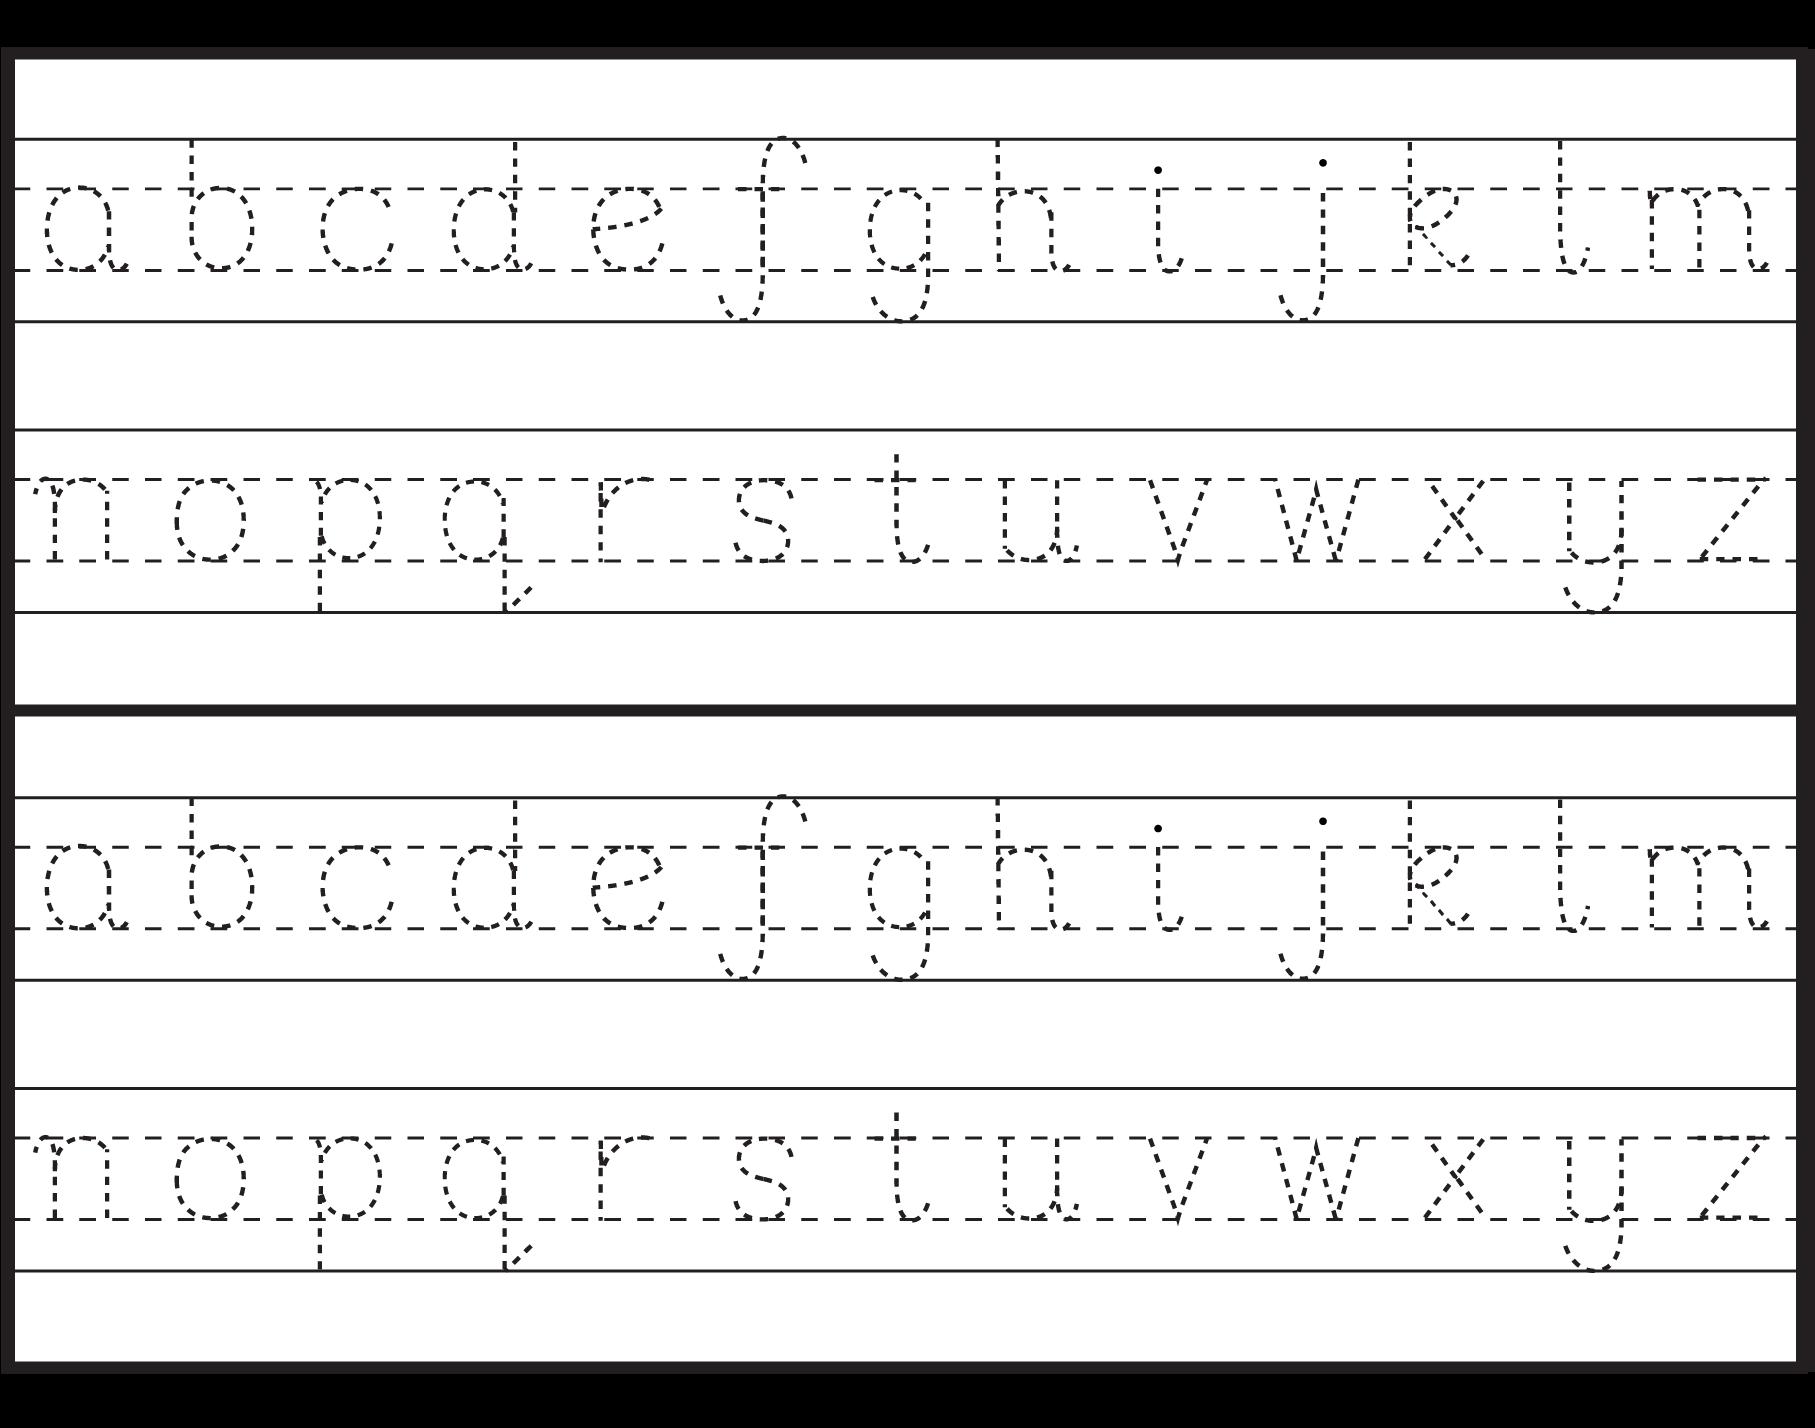 1000+ images about Kindy Writing Worksheet on Pinterest | Alphabet ...